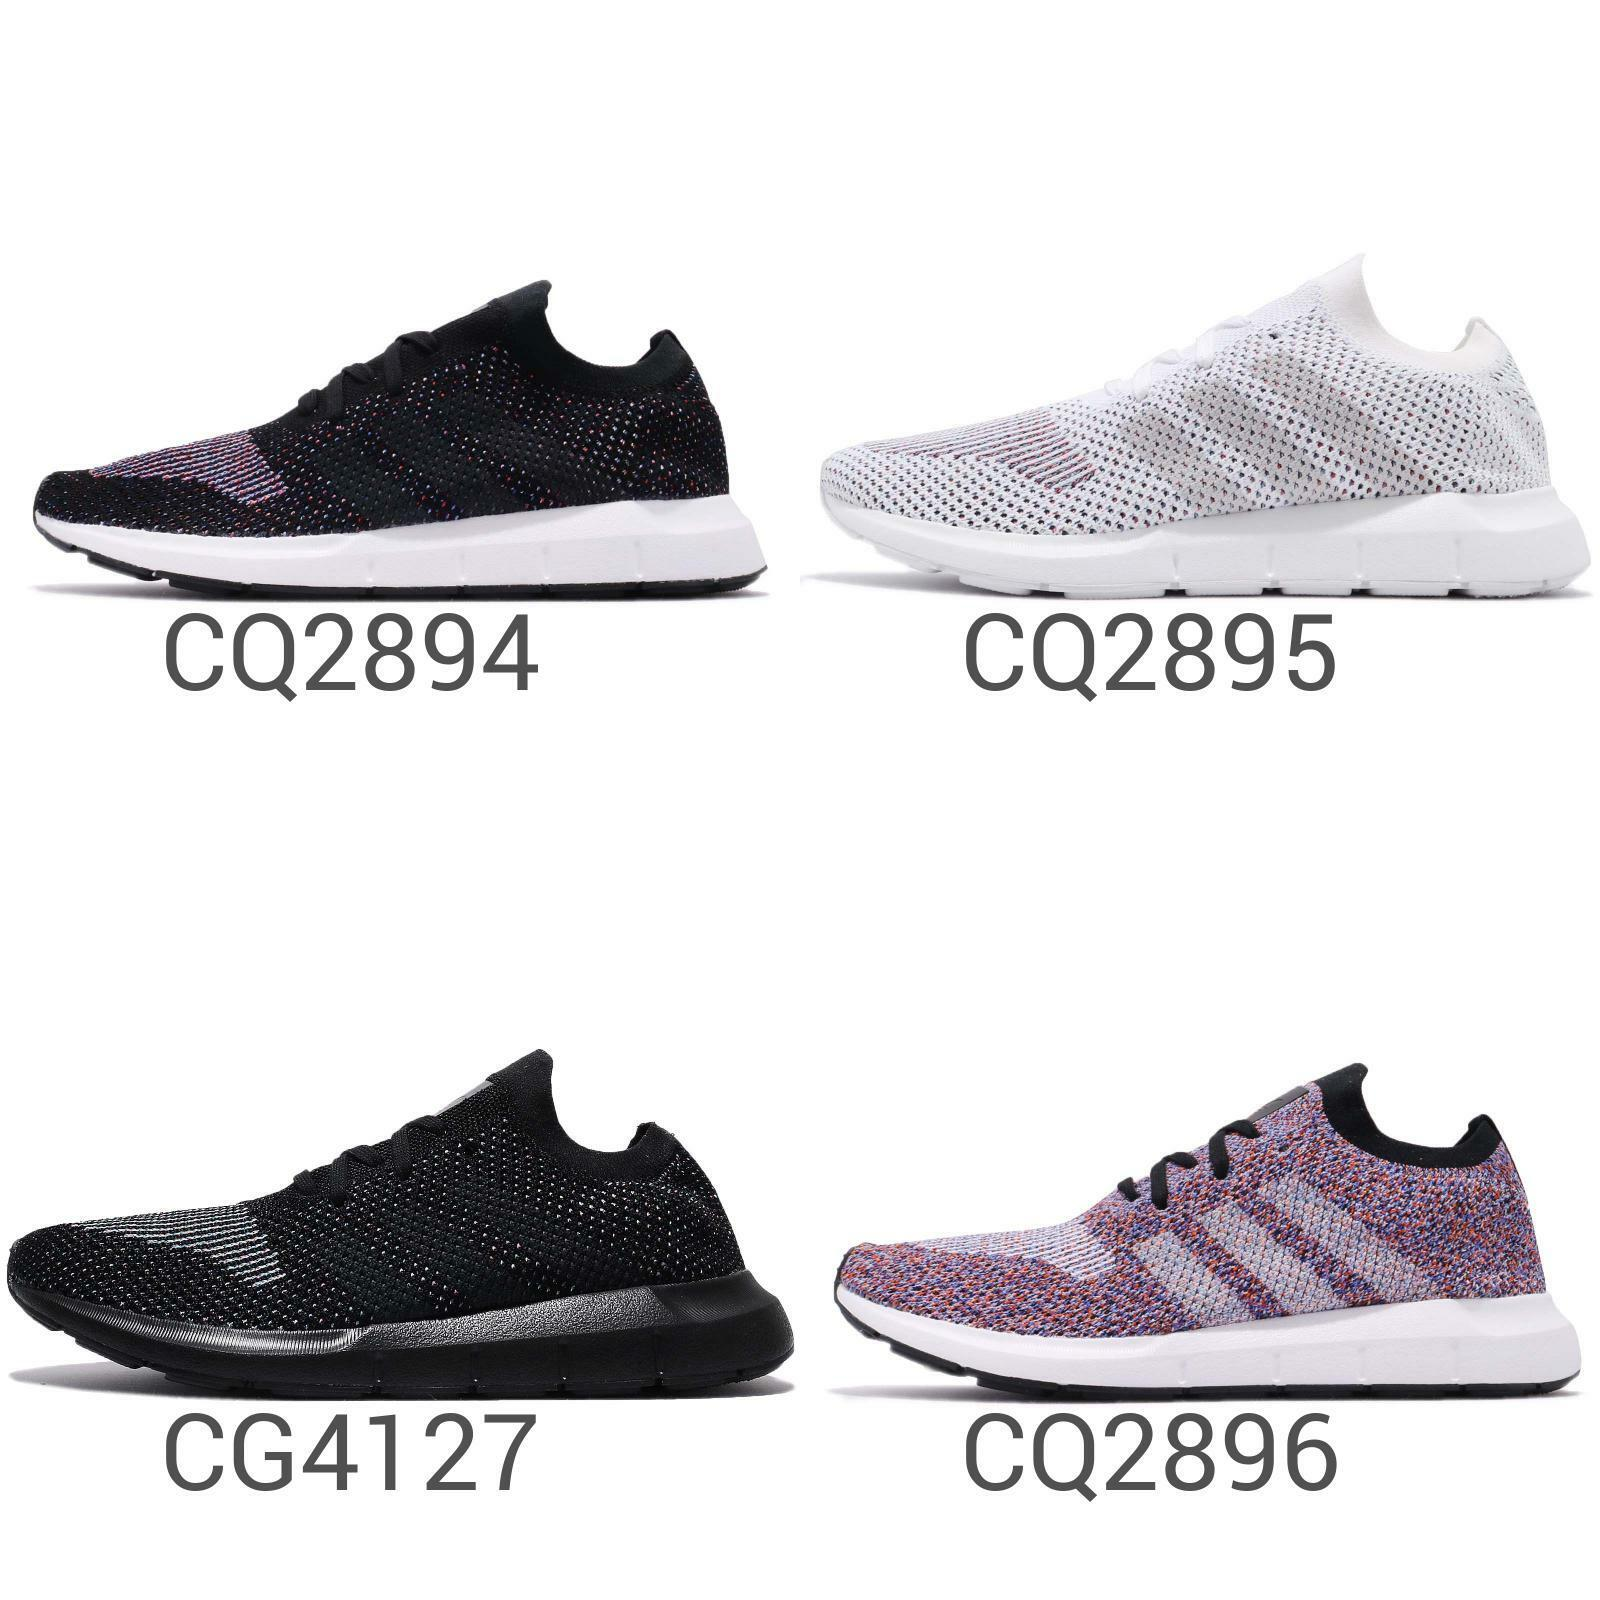 la taille des sobakov nouvelles baskets blanches adidas chewing originaux - gum originaux chewing lifestyle f911da